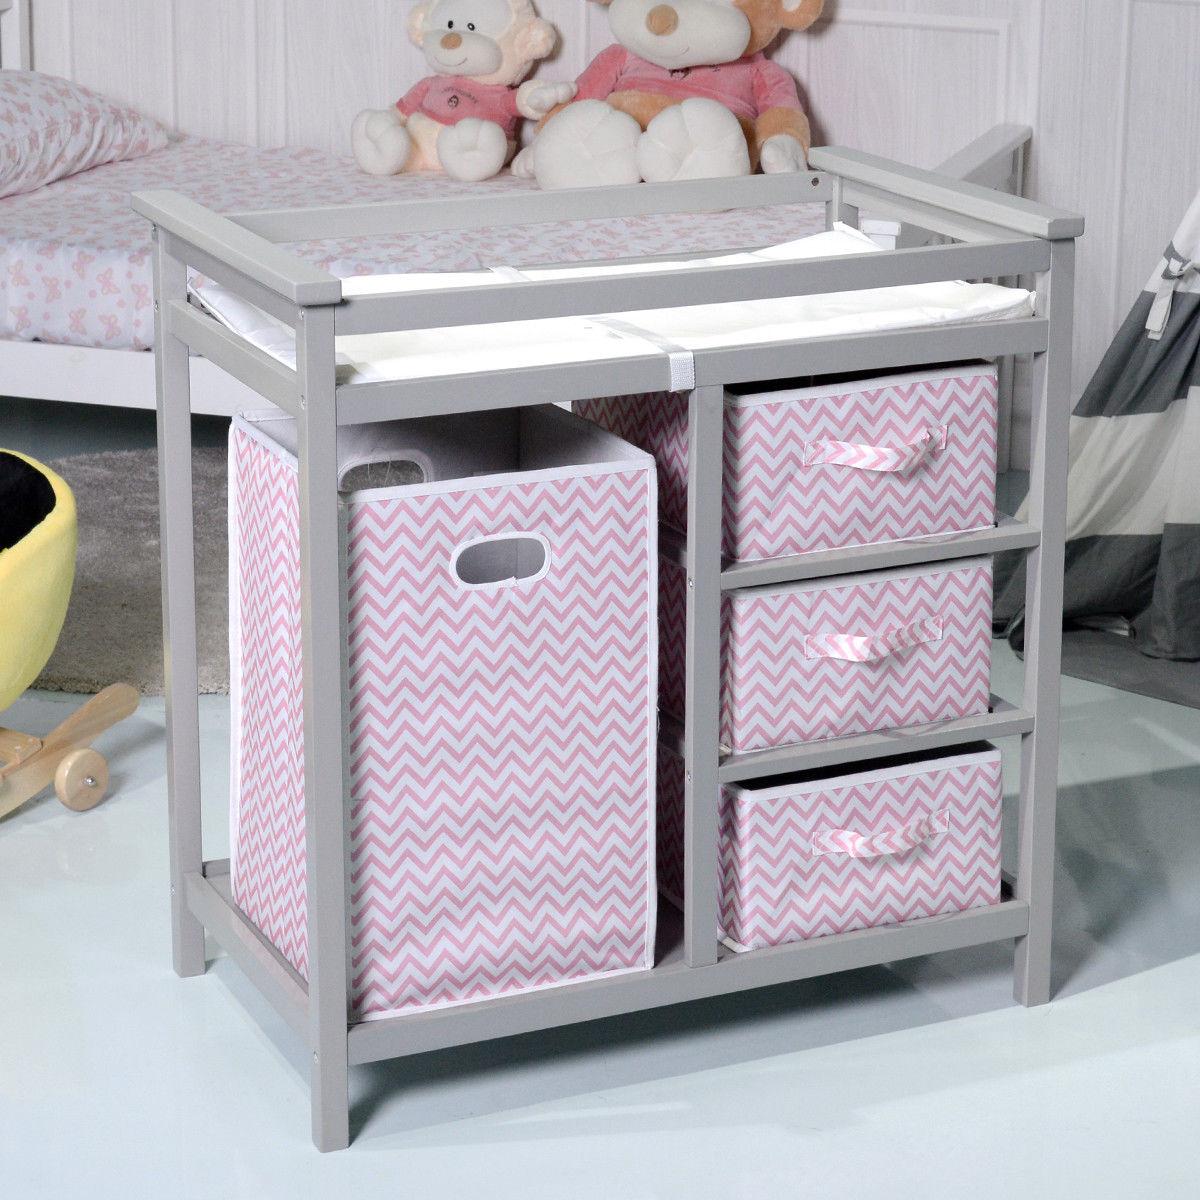 Costway Gray Pink Infant Baby Changing Table w 3 Basket Hamper Diaper Storage Nursery by costway